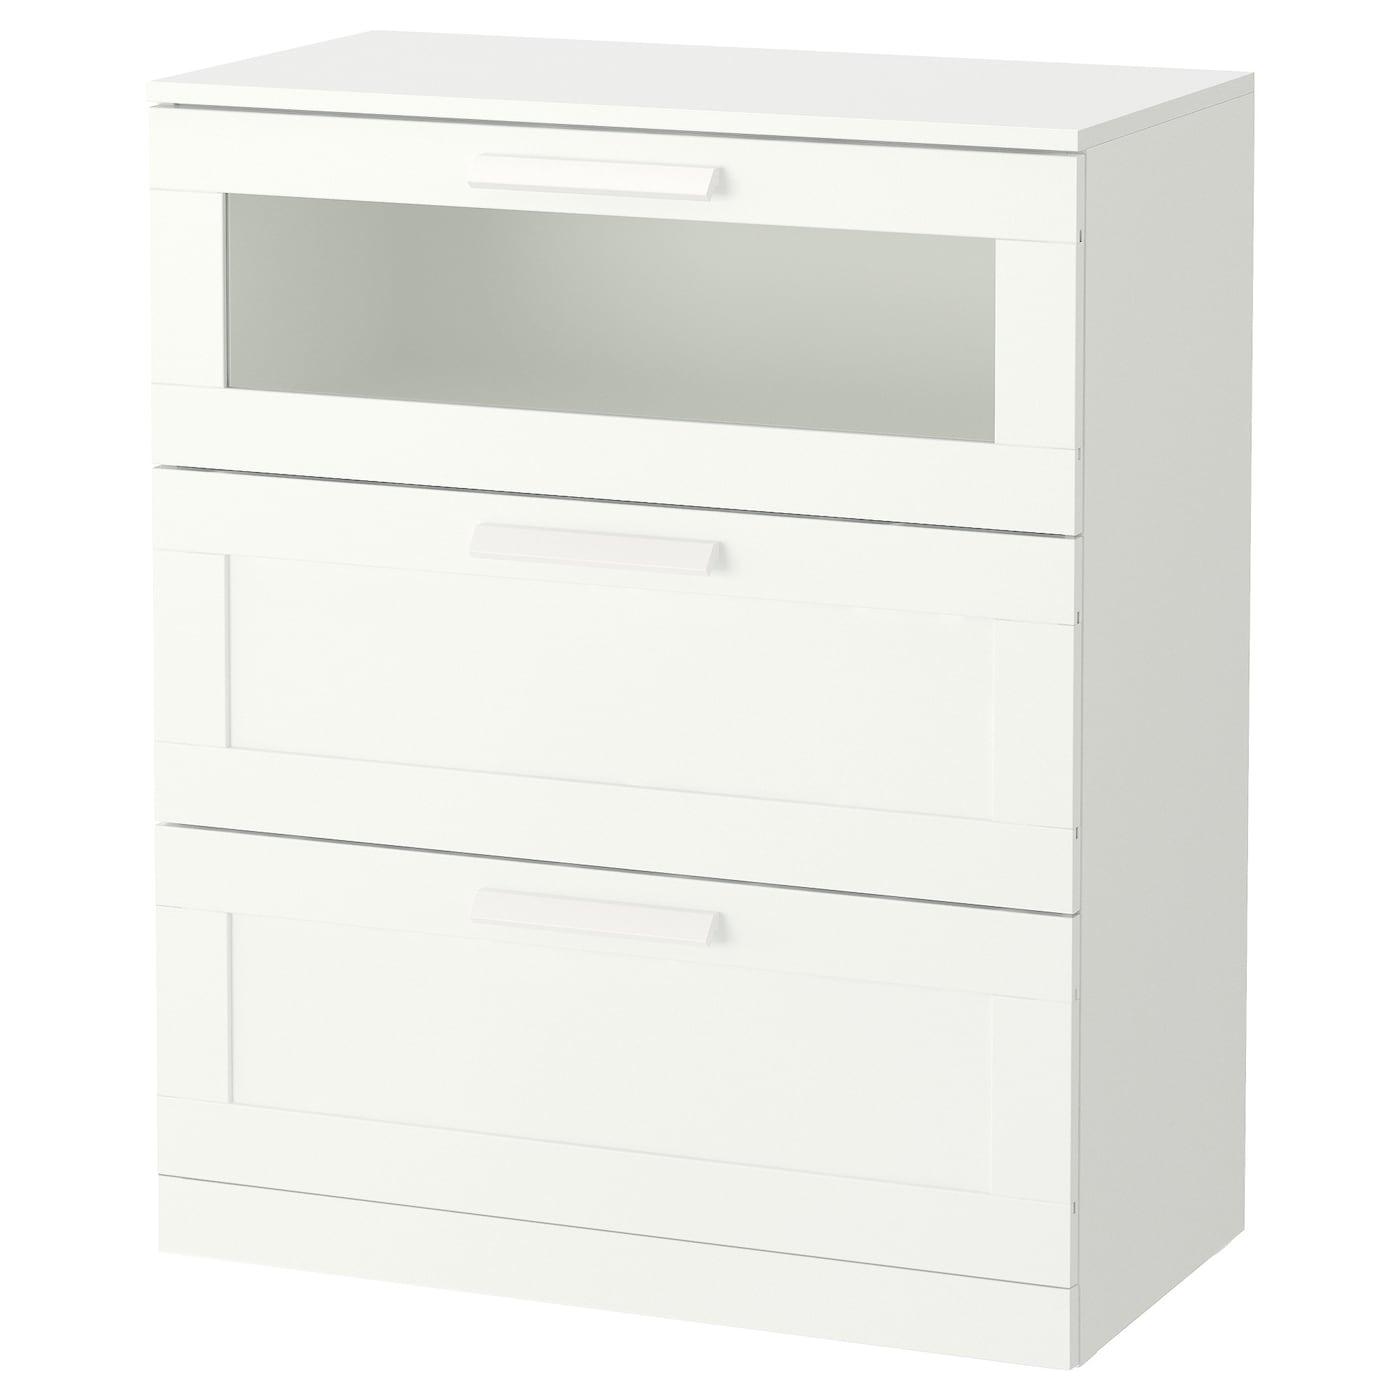 Ikea Rote Kommode 2021